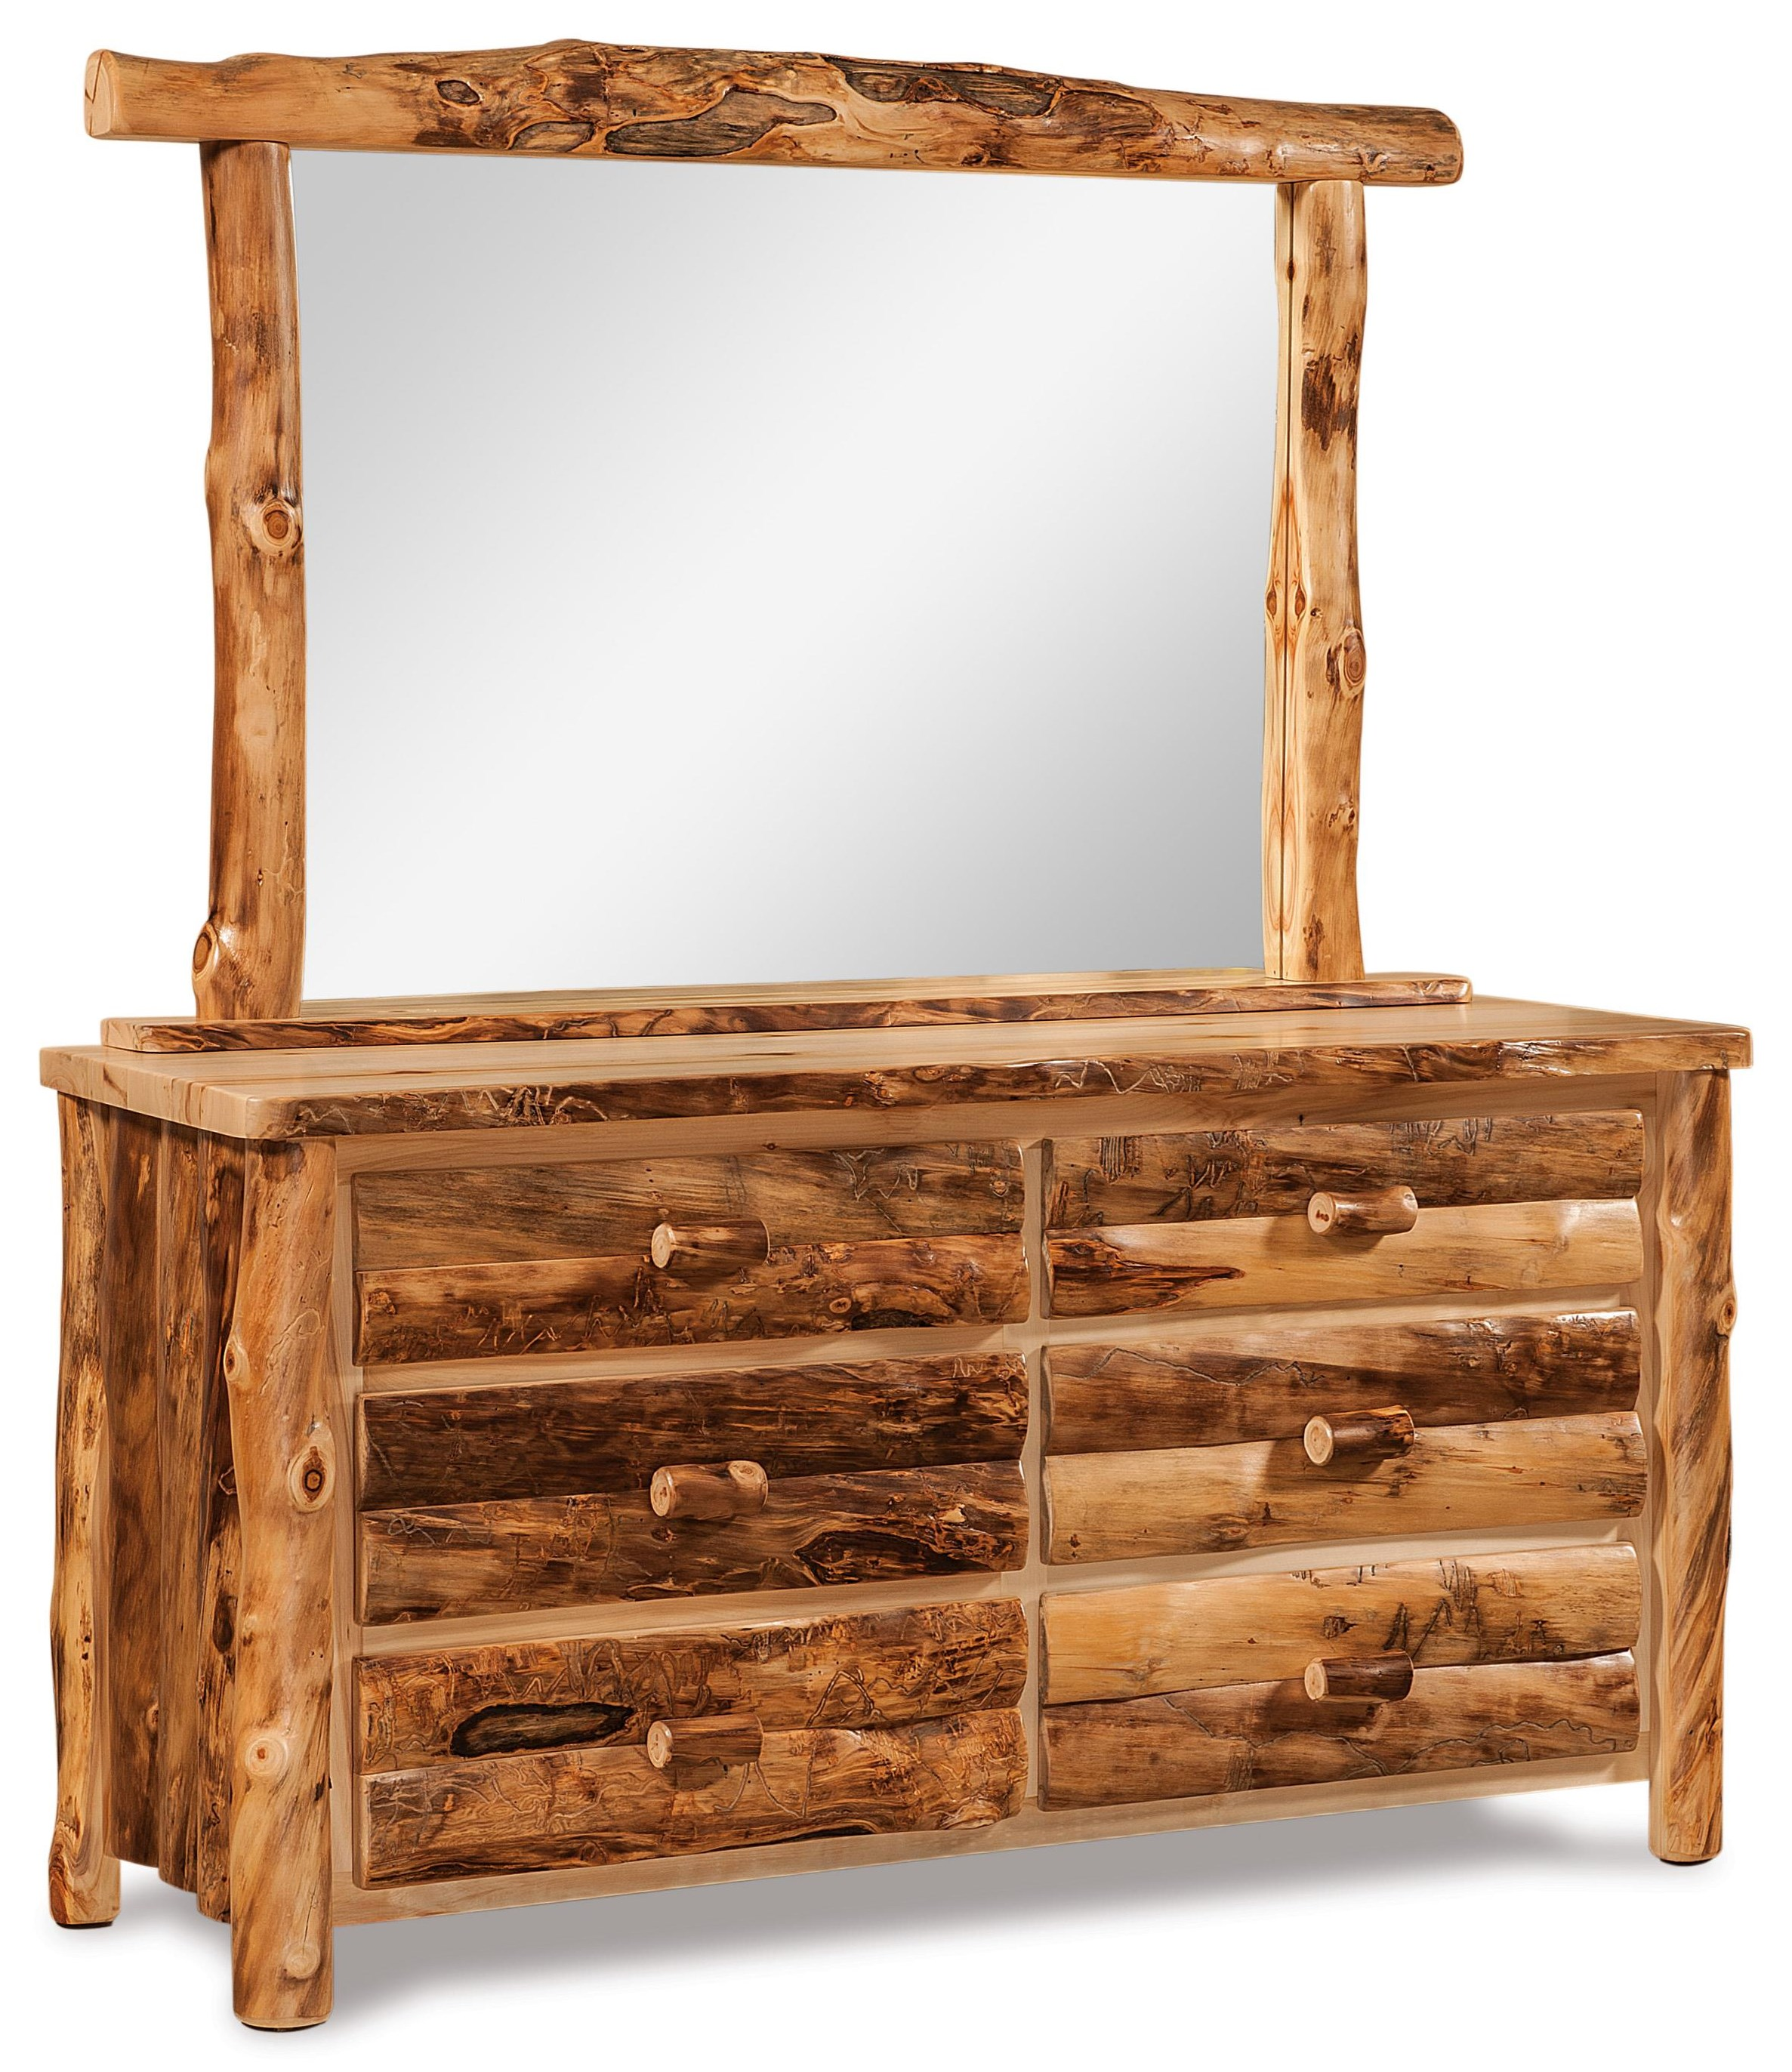 6 Drawer & Mirror